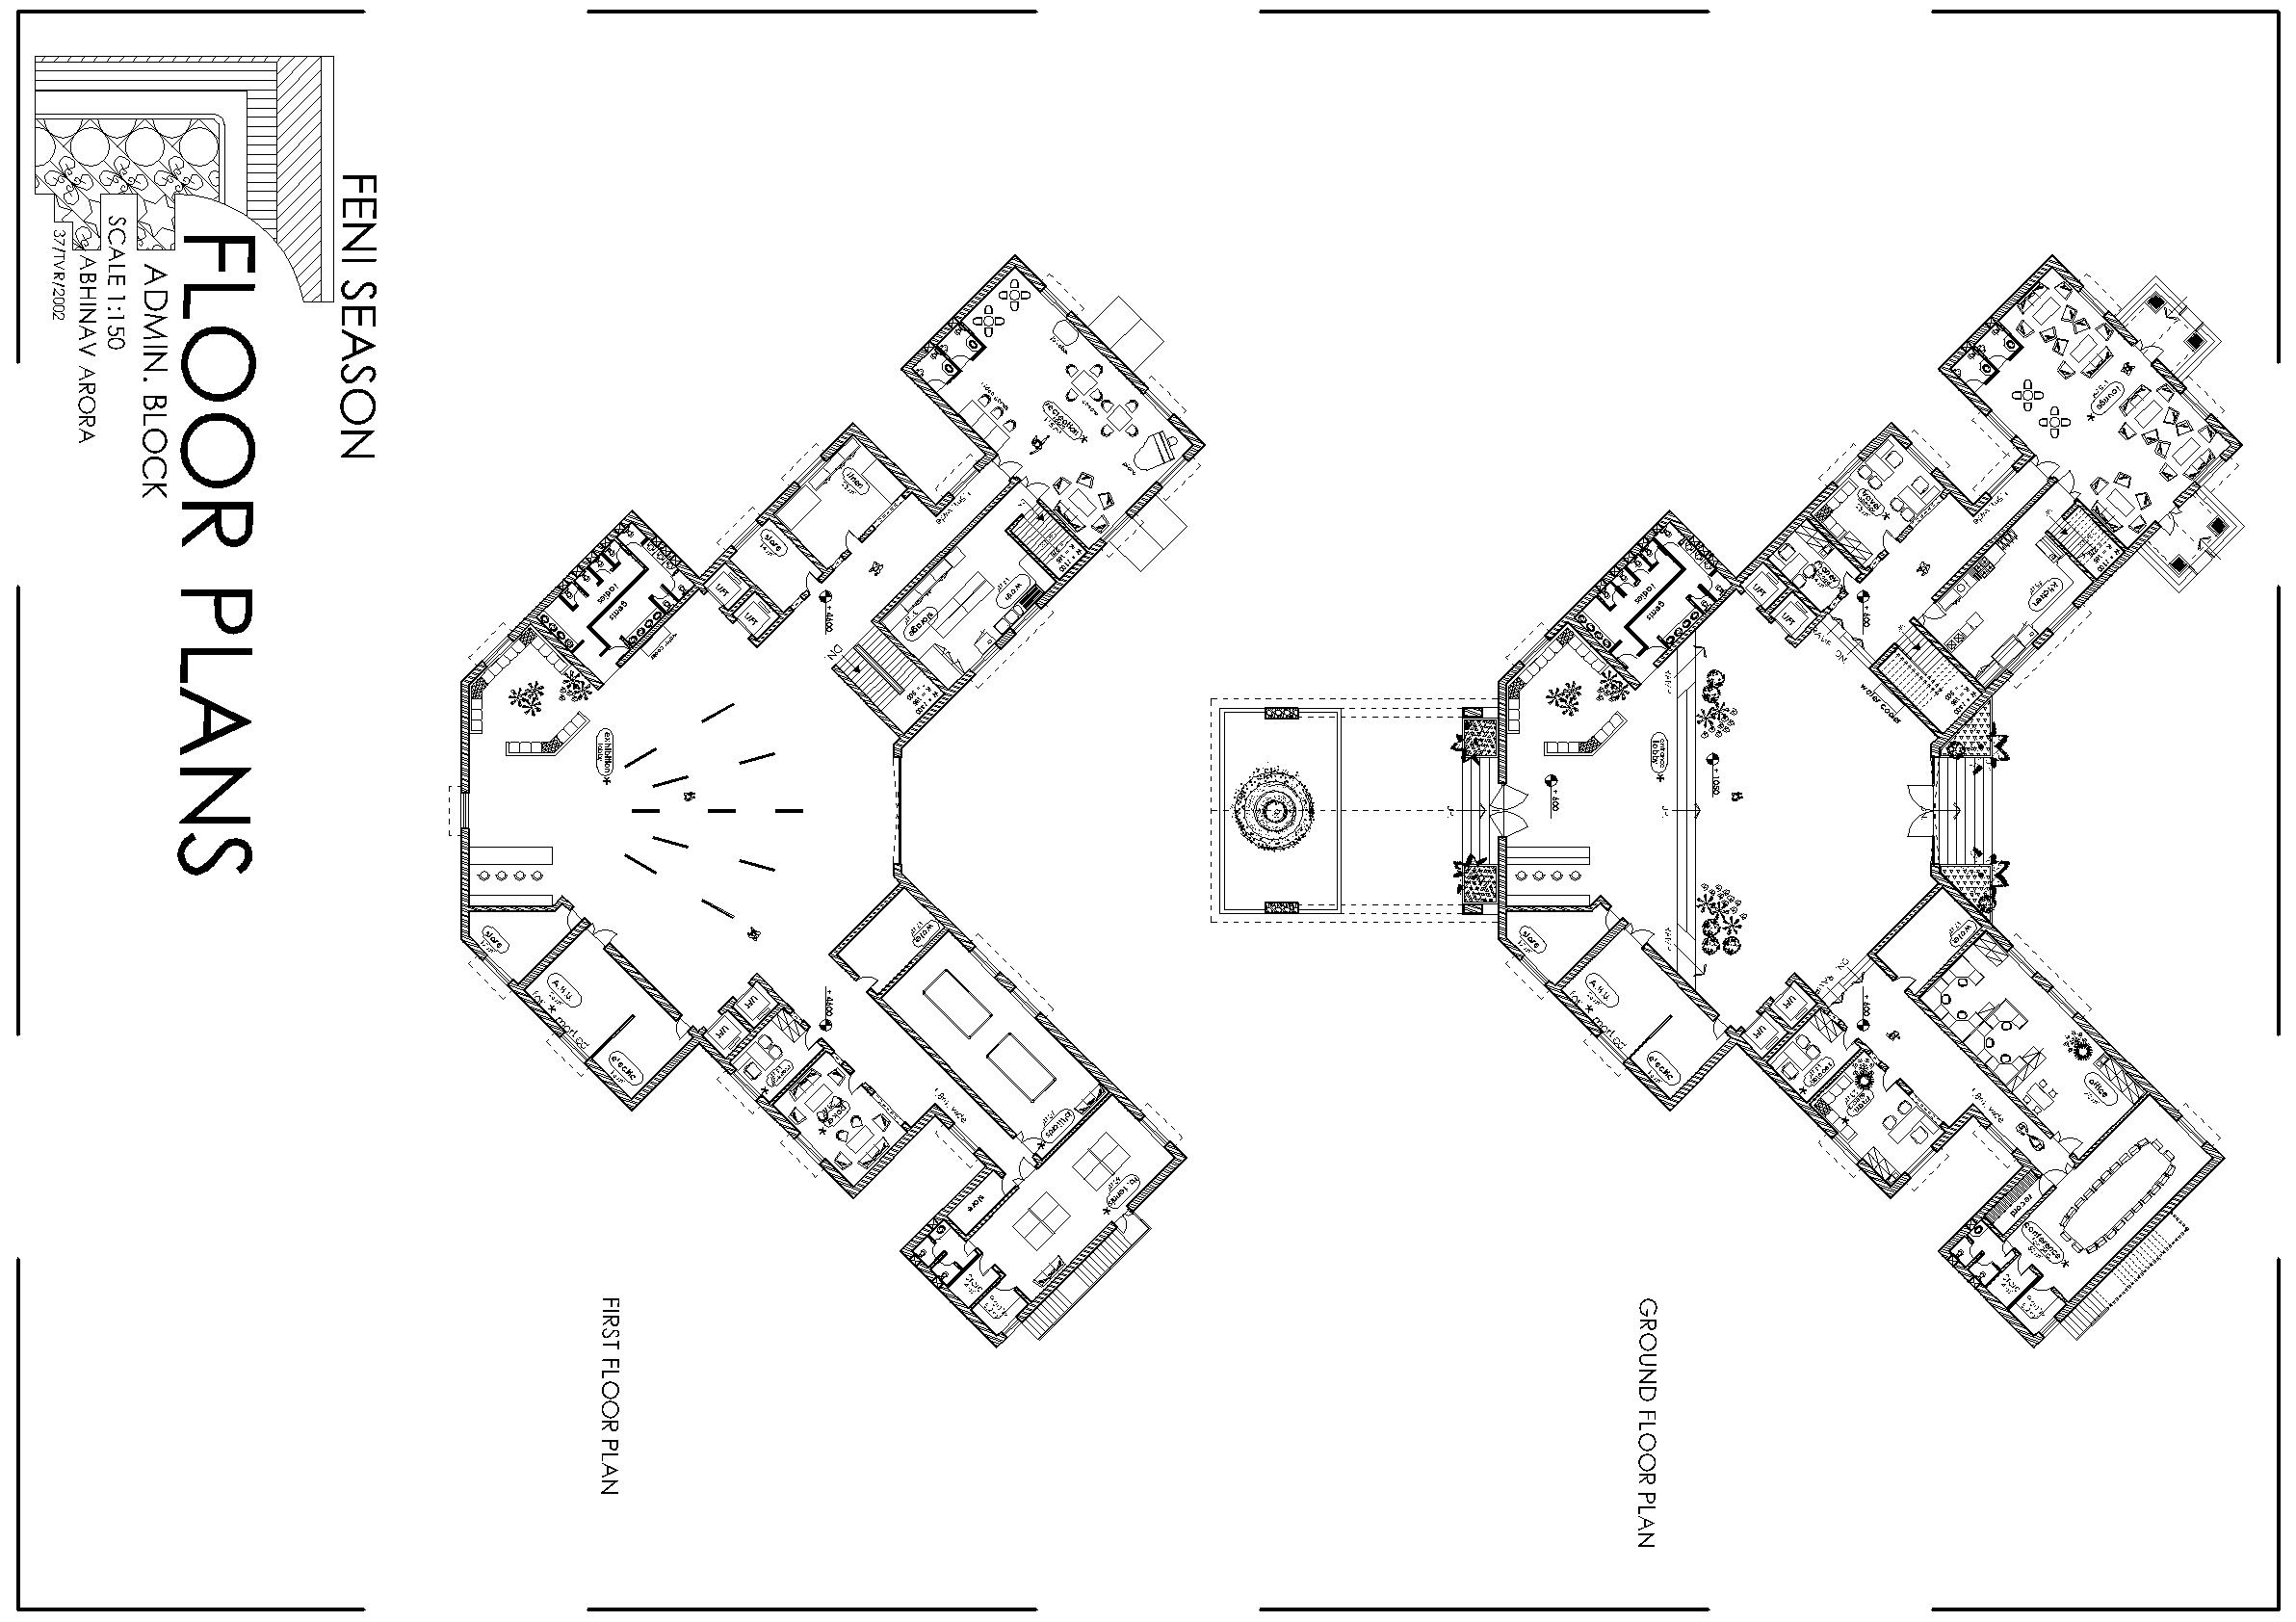 Design Thesis In Semester Ten By Abhinav Arora At Coroflot